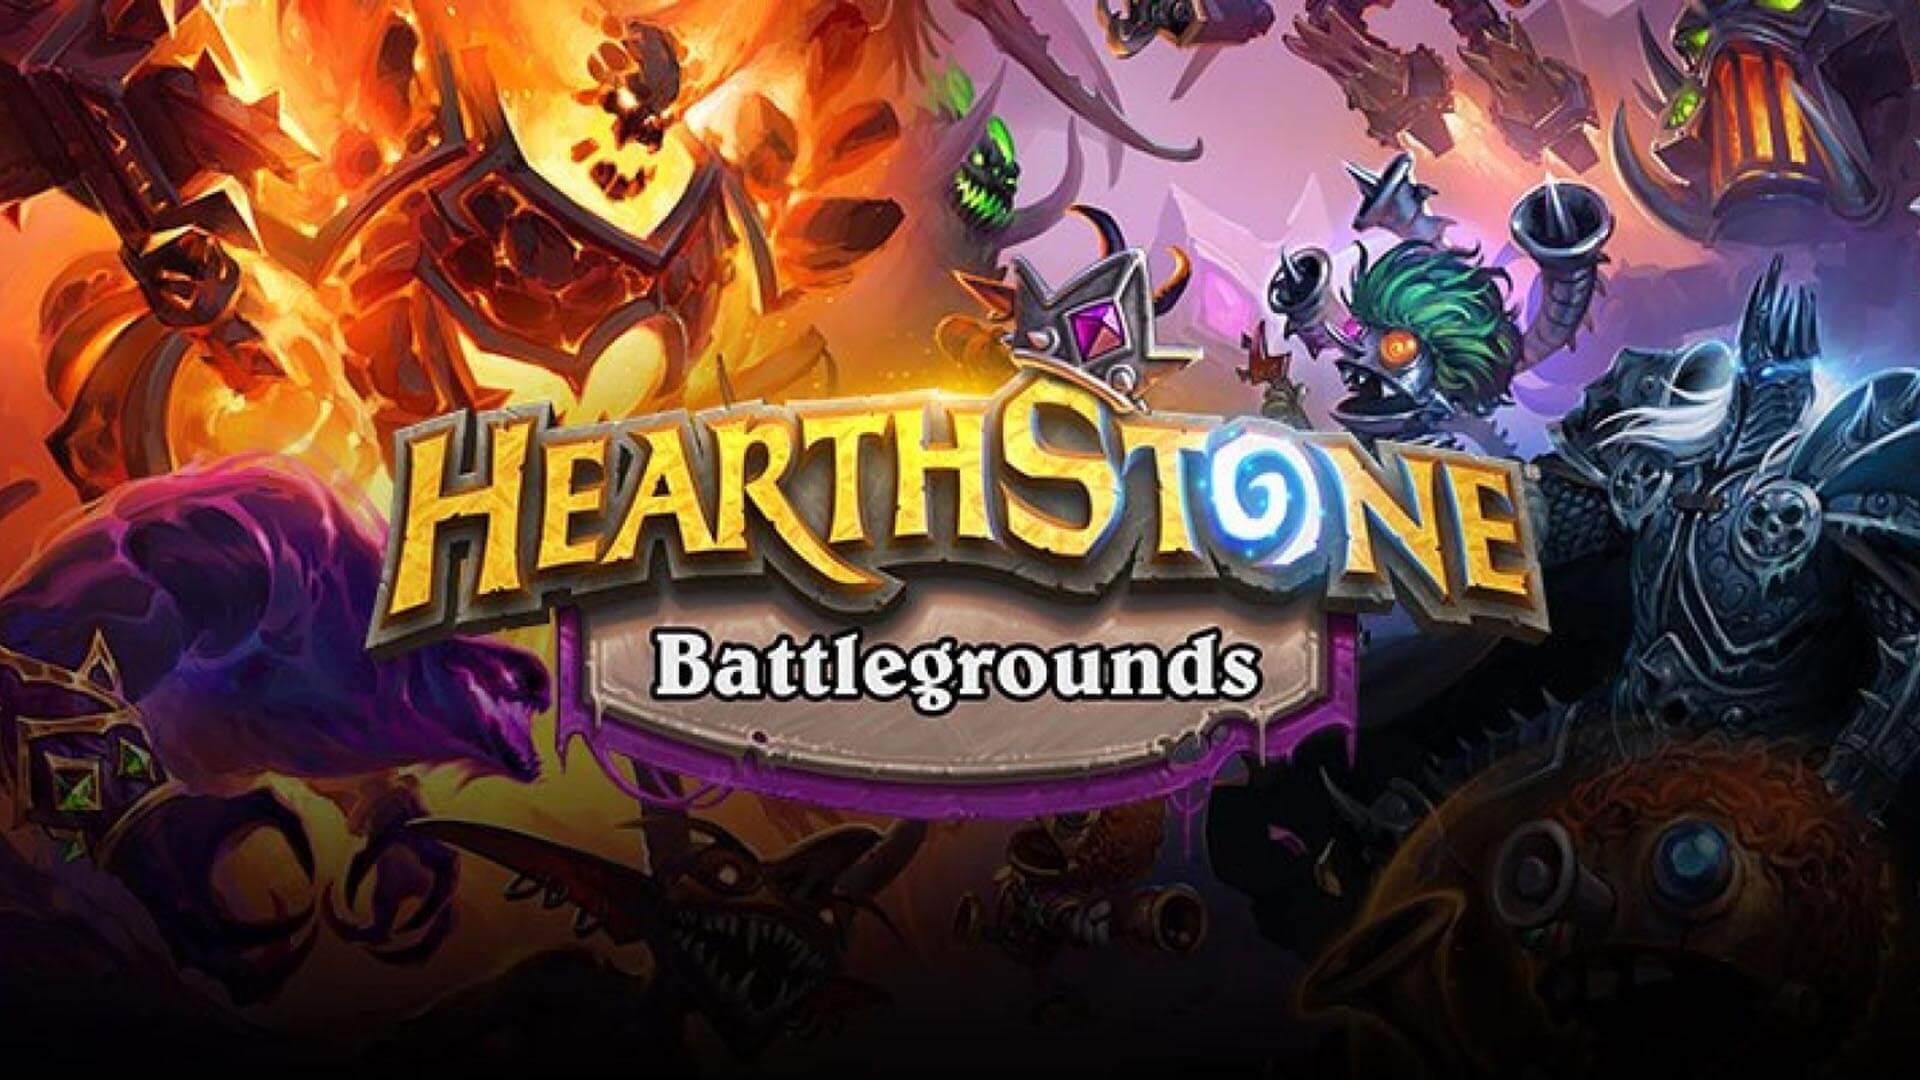 Обзор Hearthstone Battlegrounds – самый нестандартный автобаттлер года